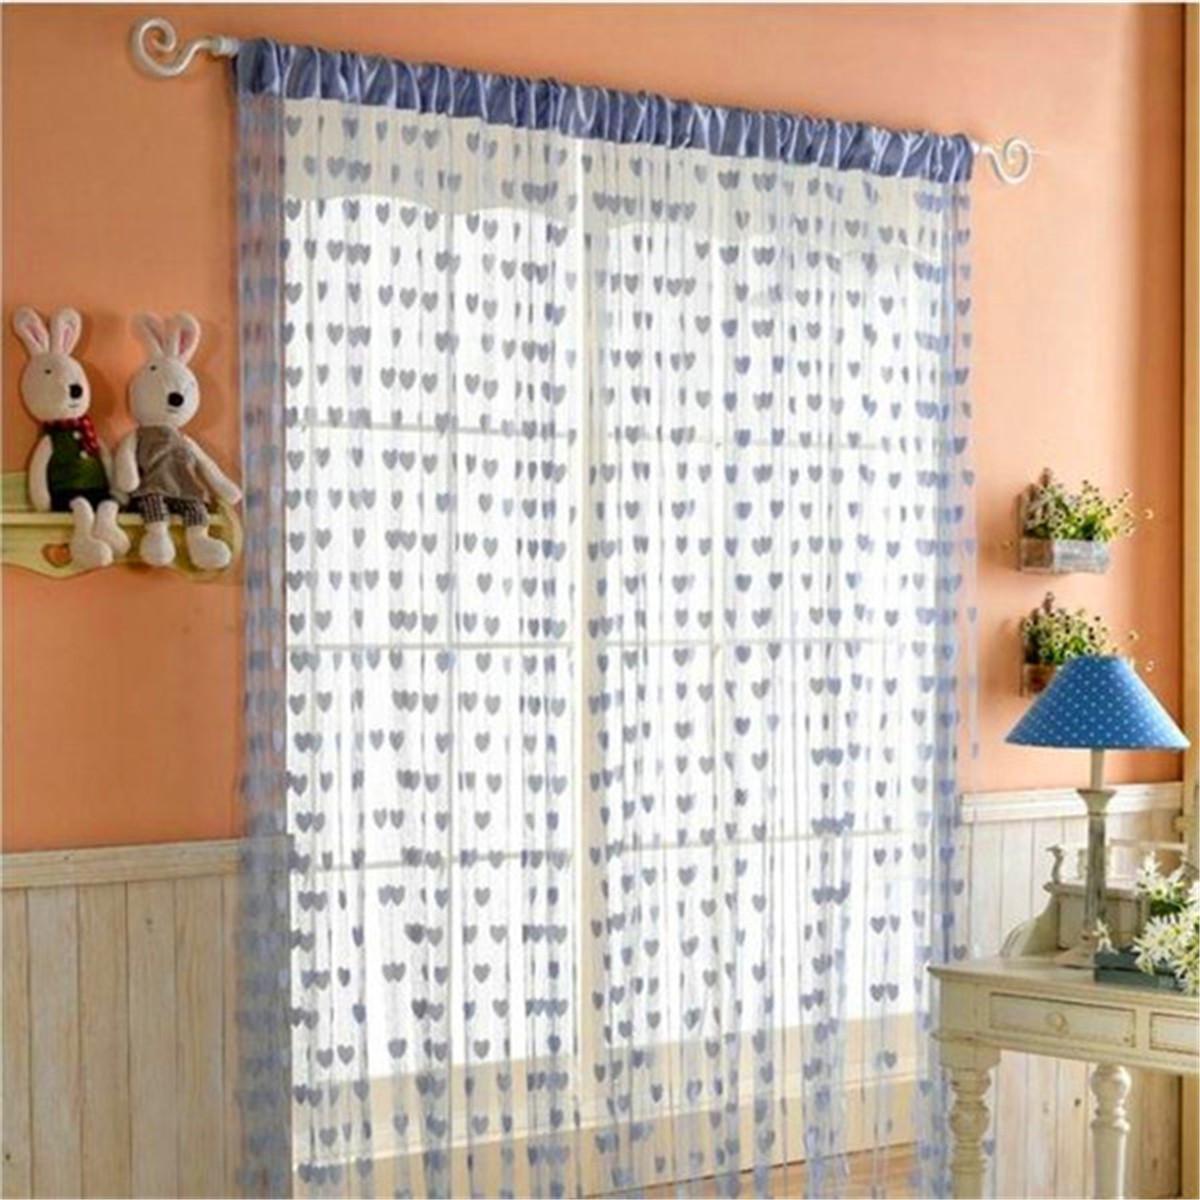 rideau fils fil voilage porte fen tre mod le coeur frange d cor 200x100cm ebay. Black Bedroom Furniture Sets. Home Design Ideas